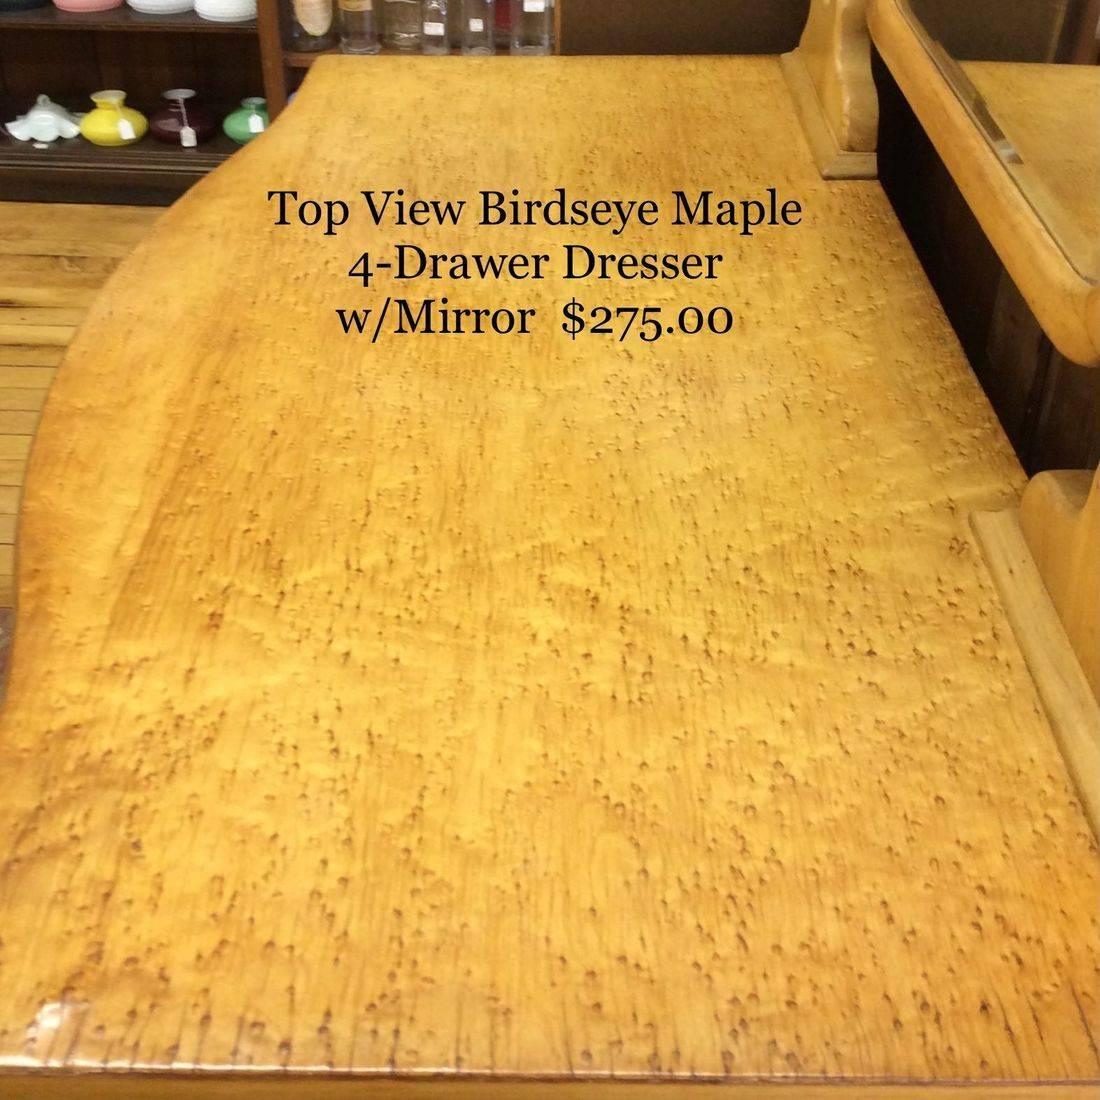 Top Surface of Birdseye Maple Dresser